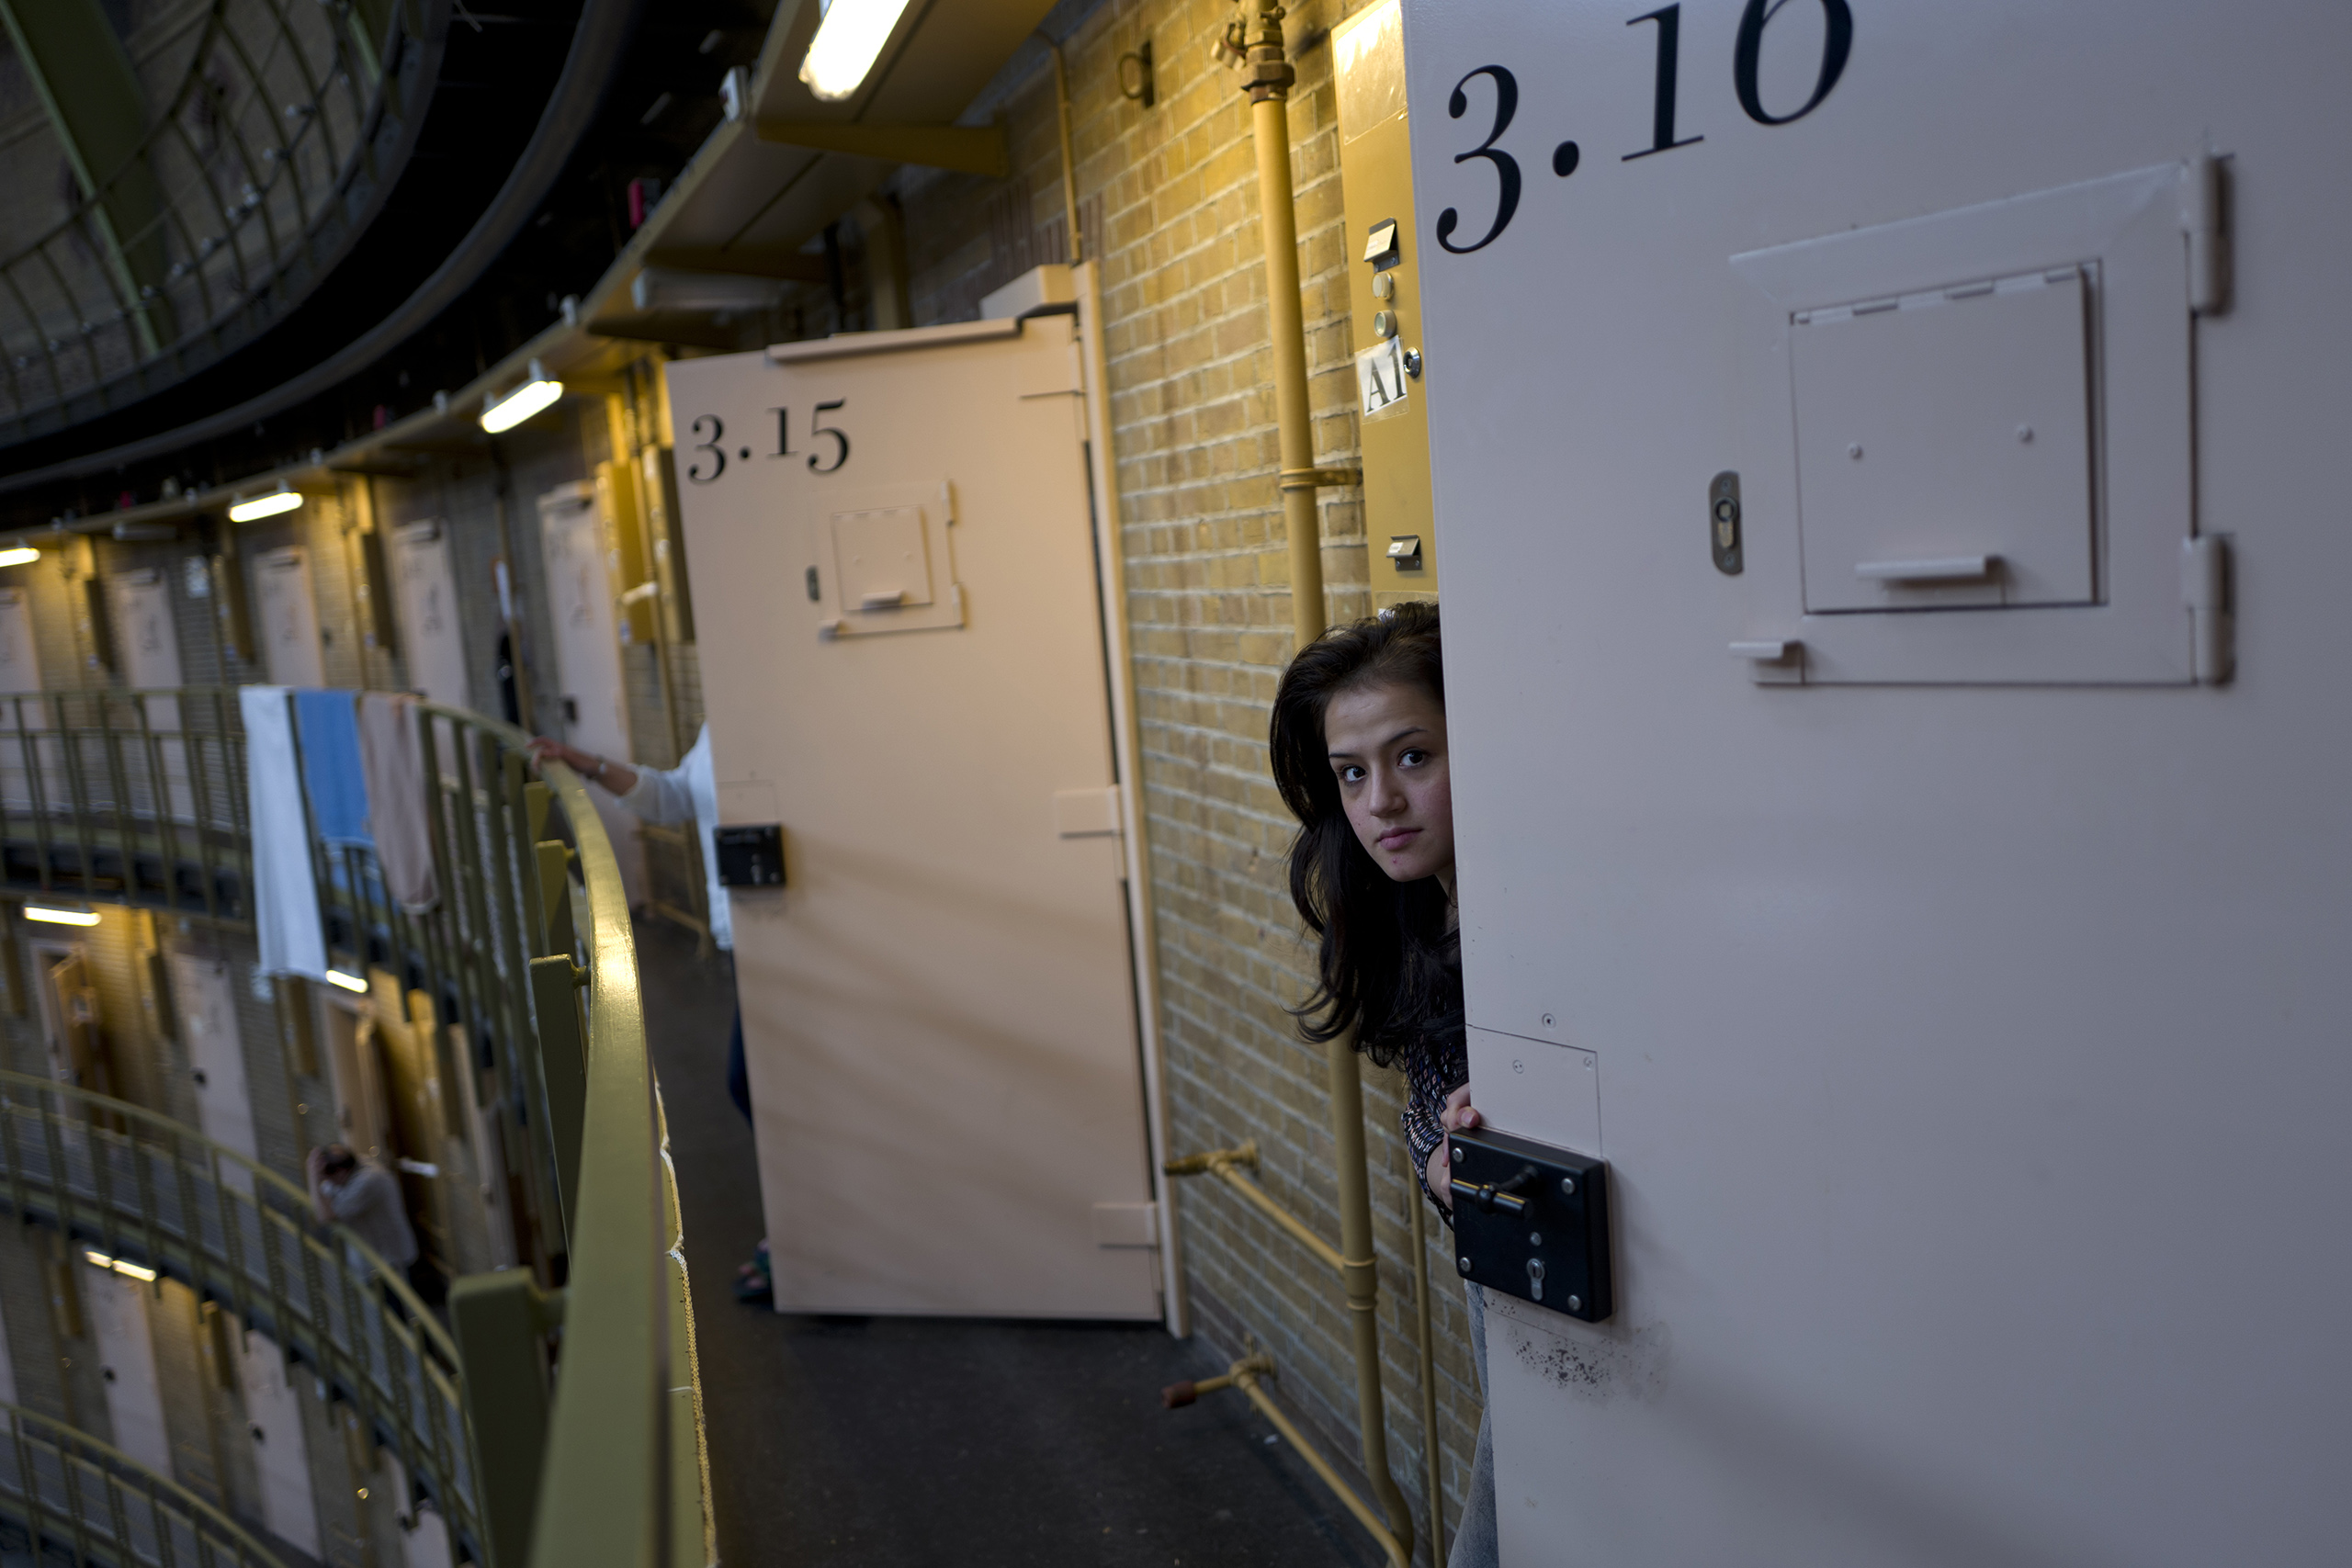 Afghan refugee Shazia Lutfi, 19, peeks through the door of her room at the former prison of De Koepel in Haarlem, Netherlands, May 7, 2016.